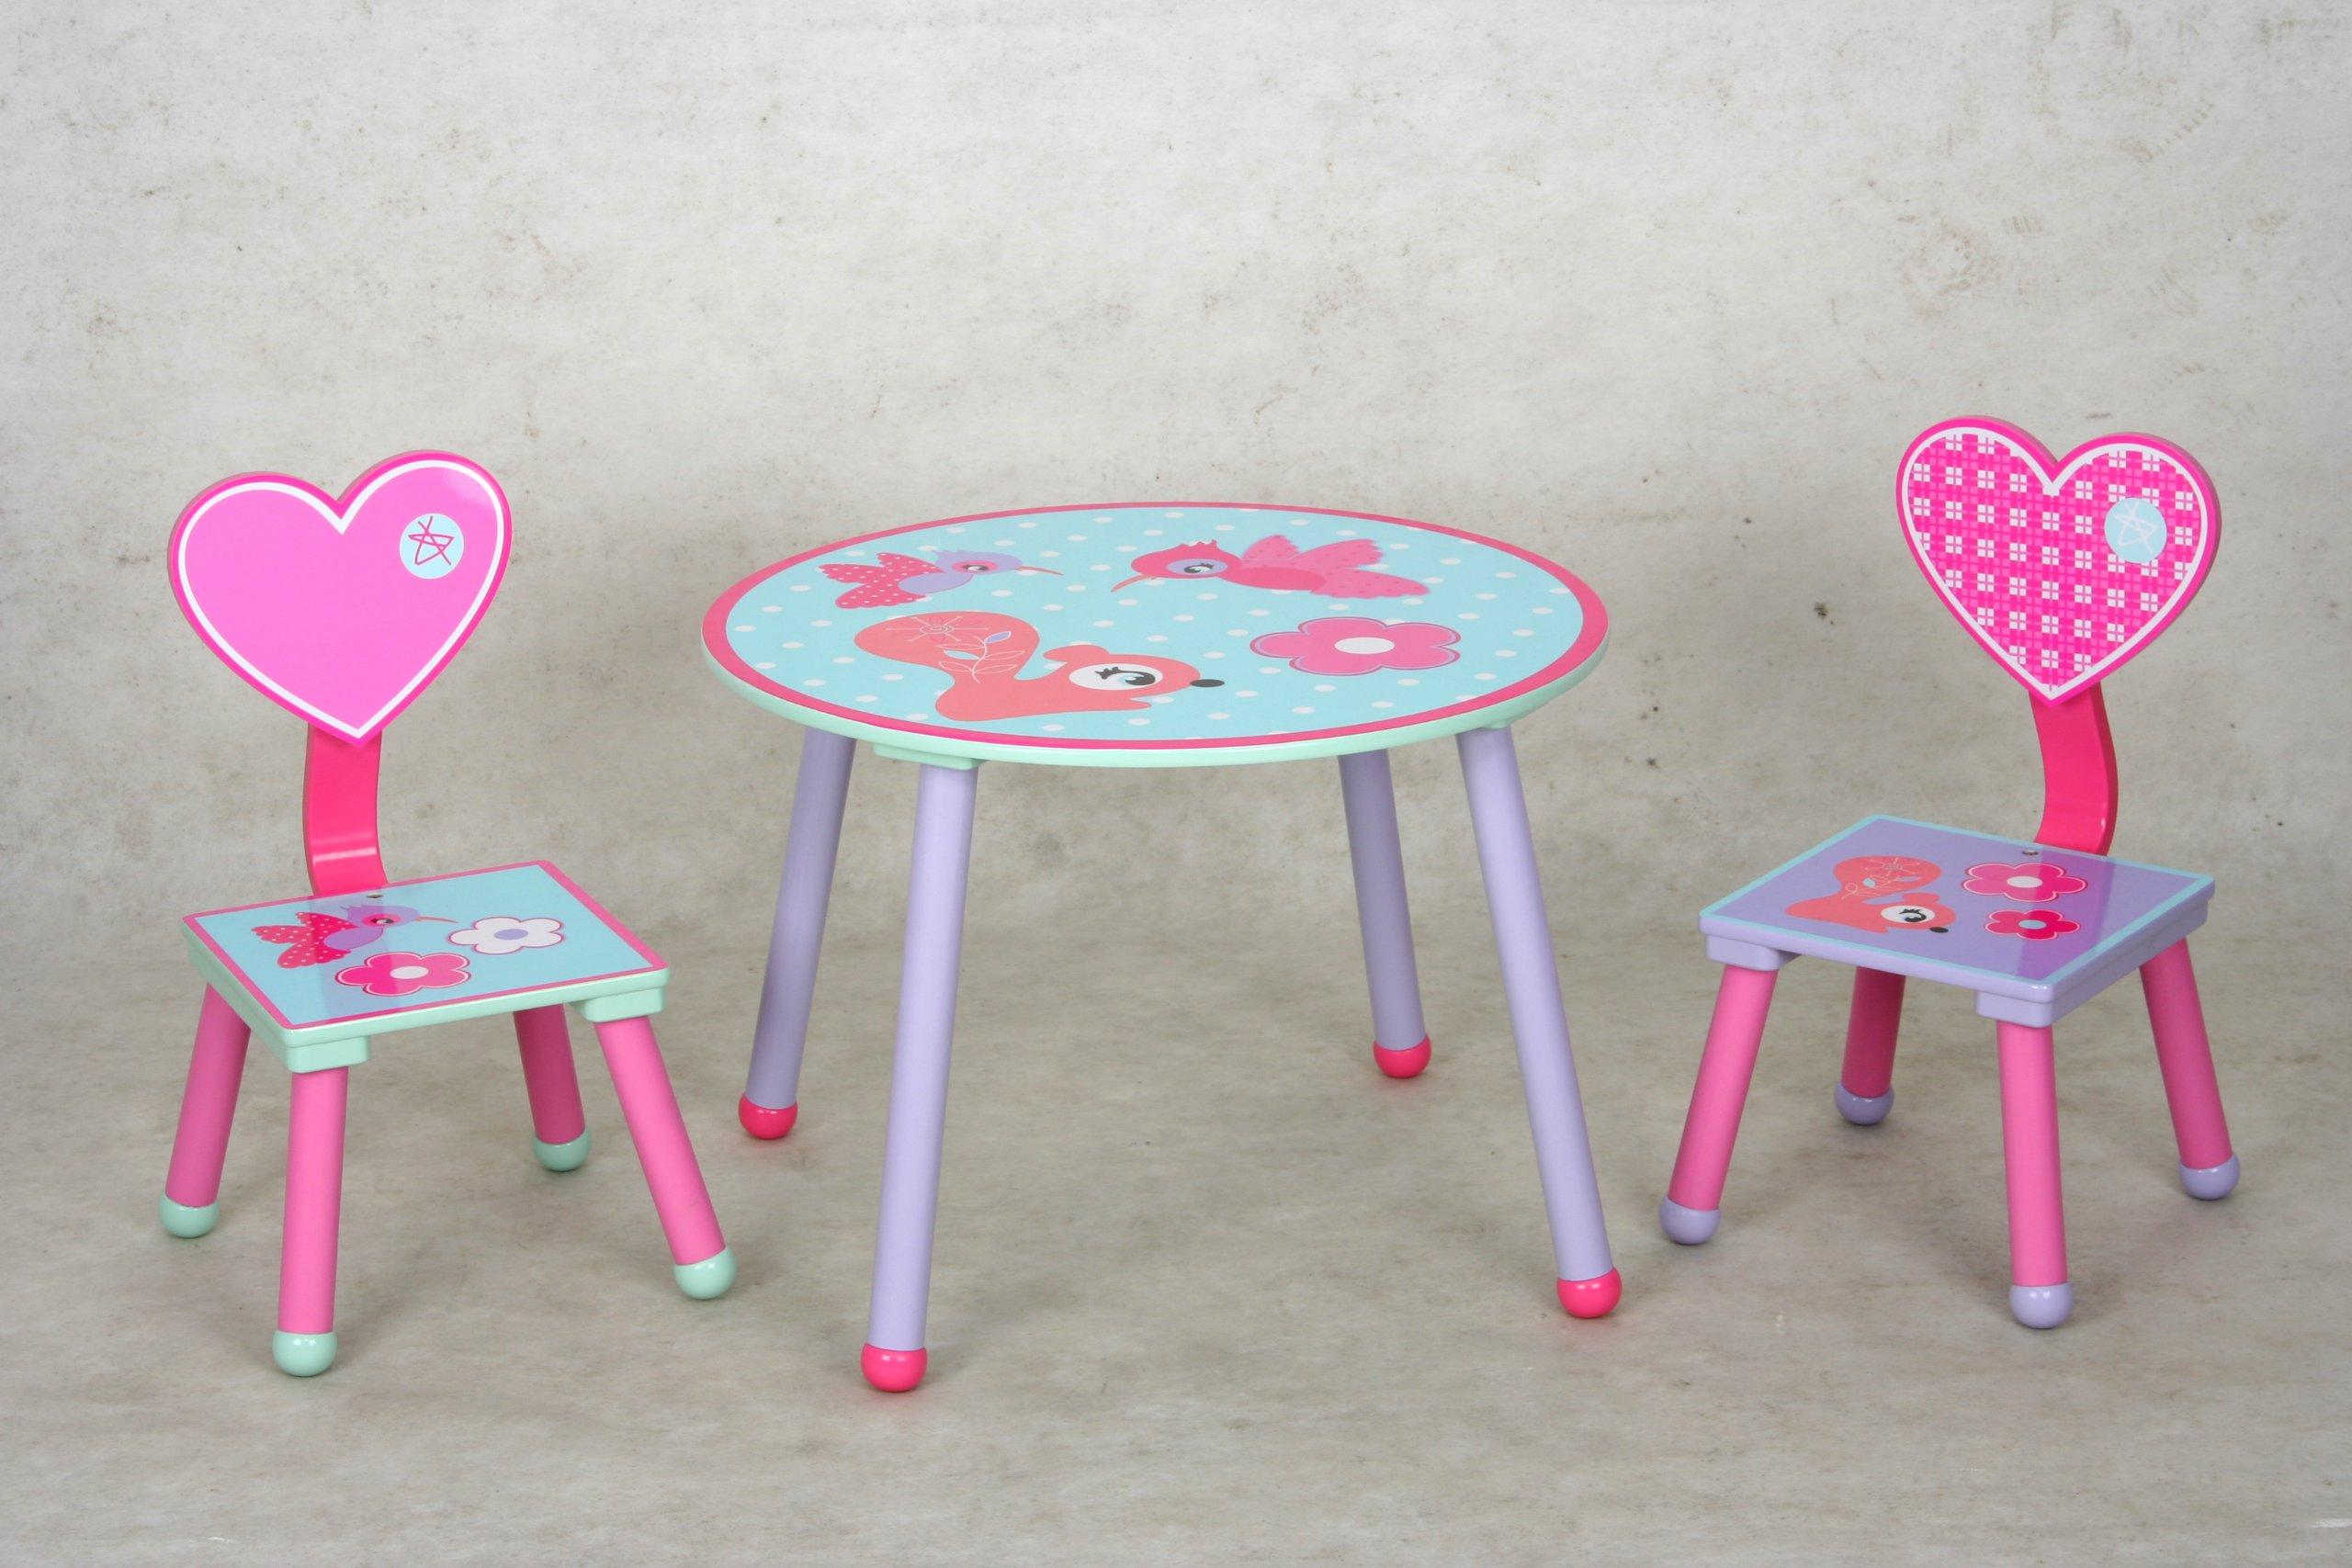 eHemco Kids Table and Chair Set - Heart Theme